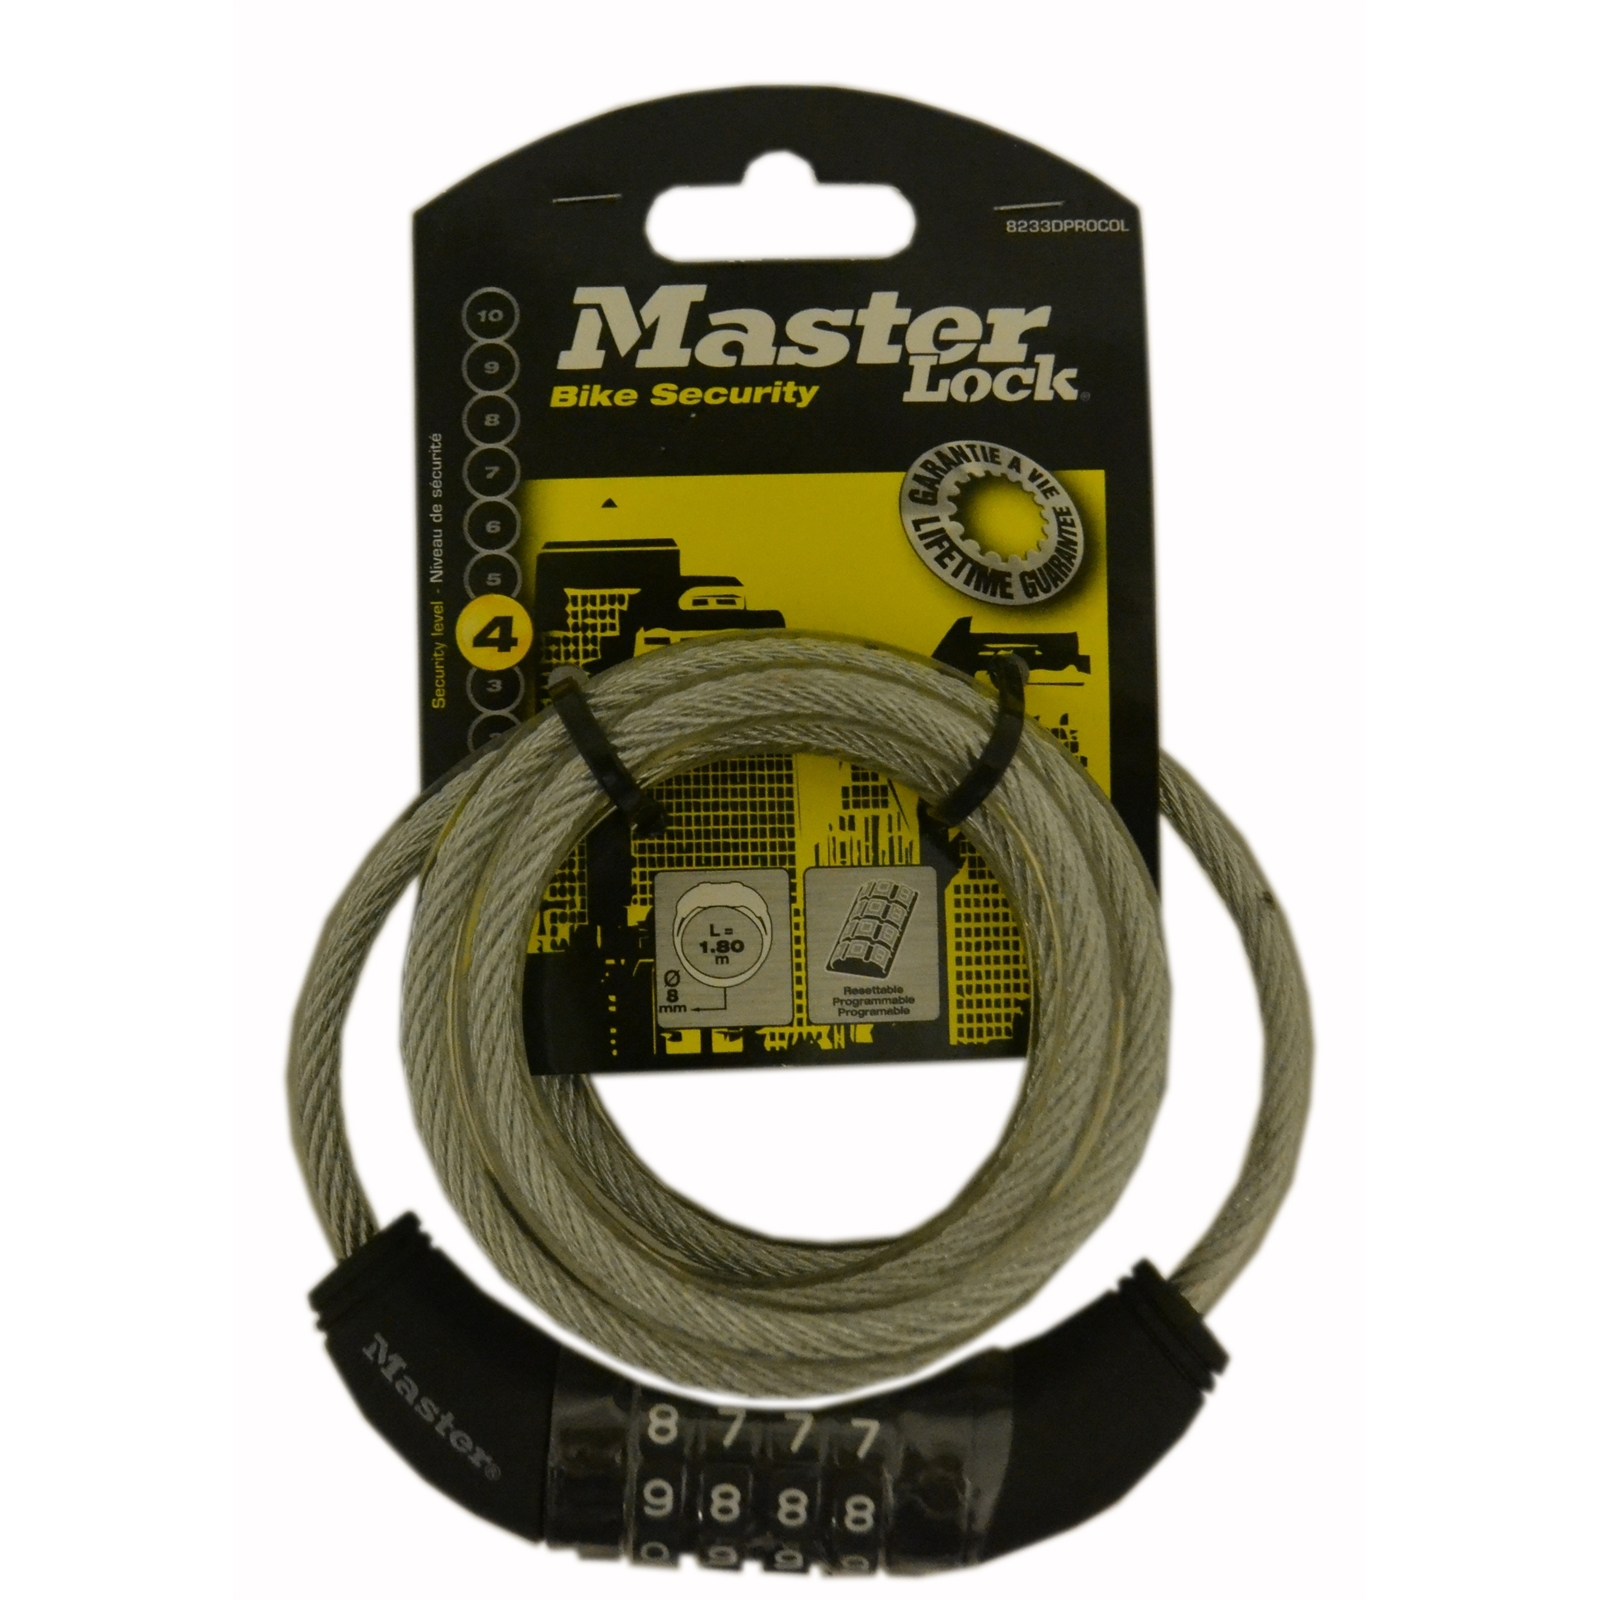 Master Lock 1.8m x 8mm Combination Bike Lock